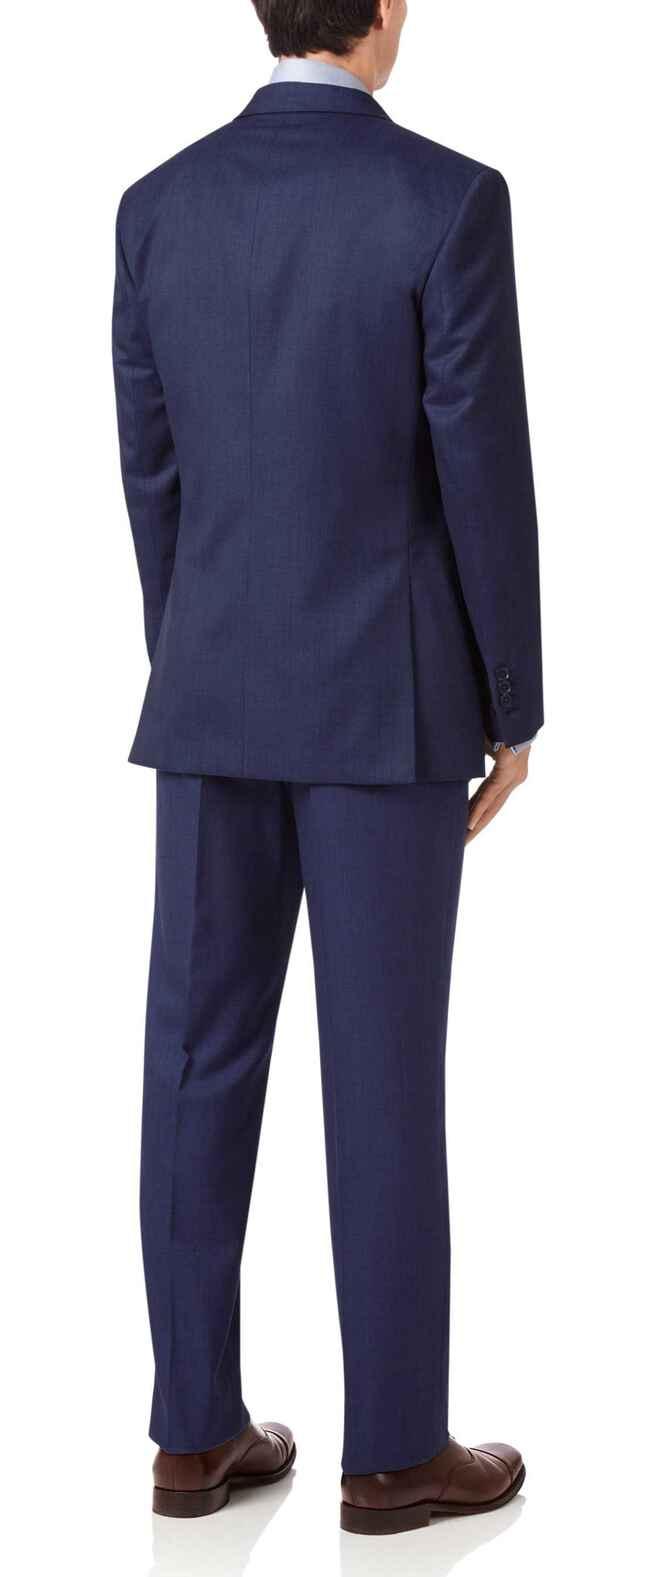 Indigo slim fit hairline business suit